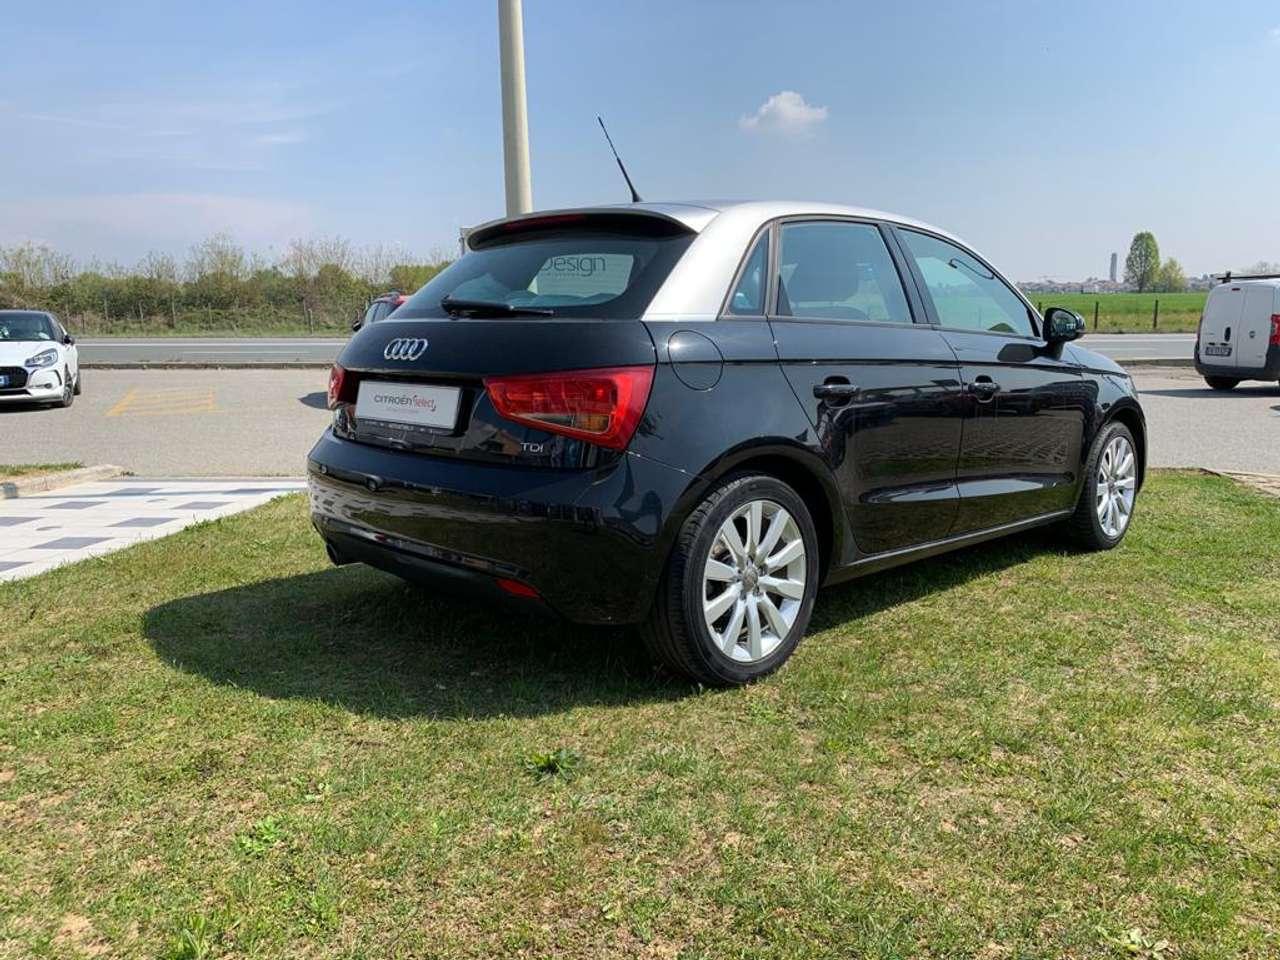 Audi_A1_Sportback_Diesel_Usata_Cirié_Autojet_4